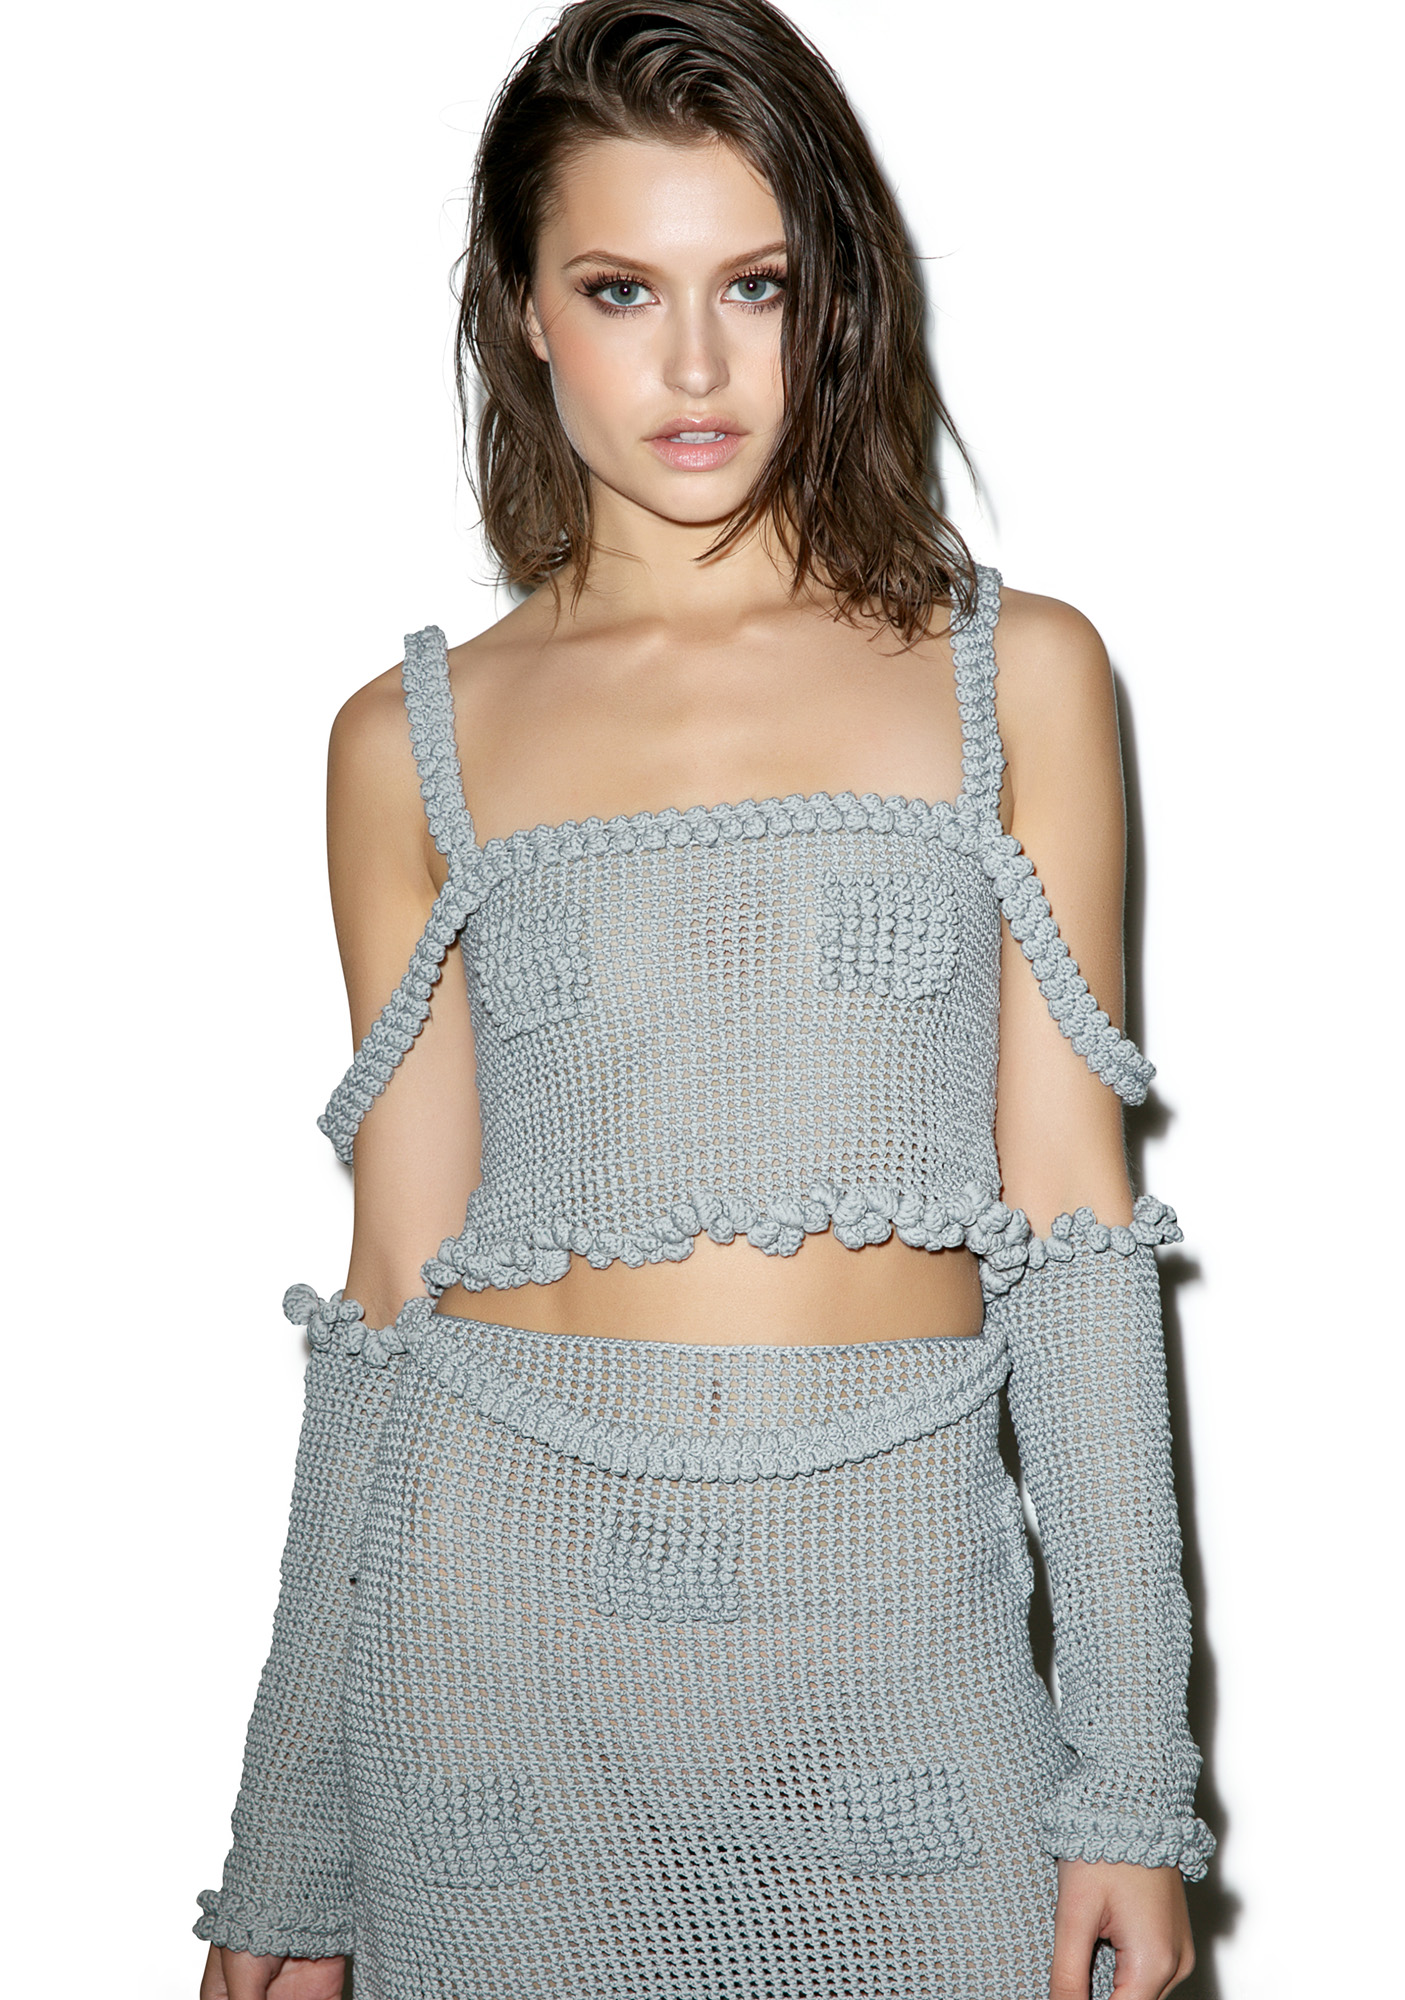 Maria ke Fisherman Candy Mesh Crochet Crop Top With Arm Warmers